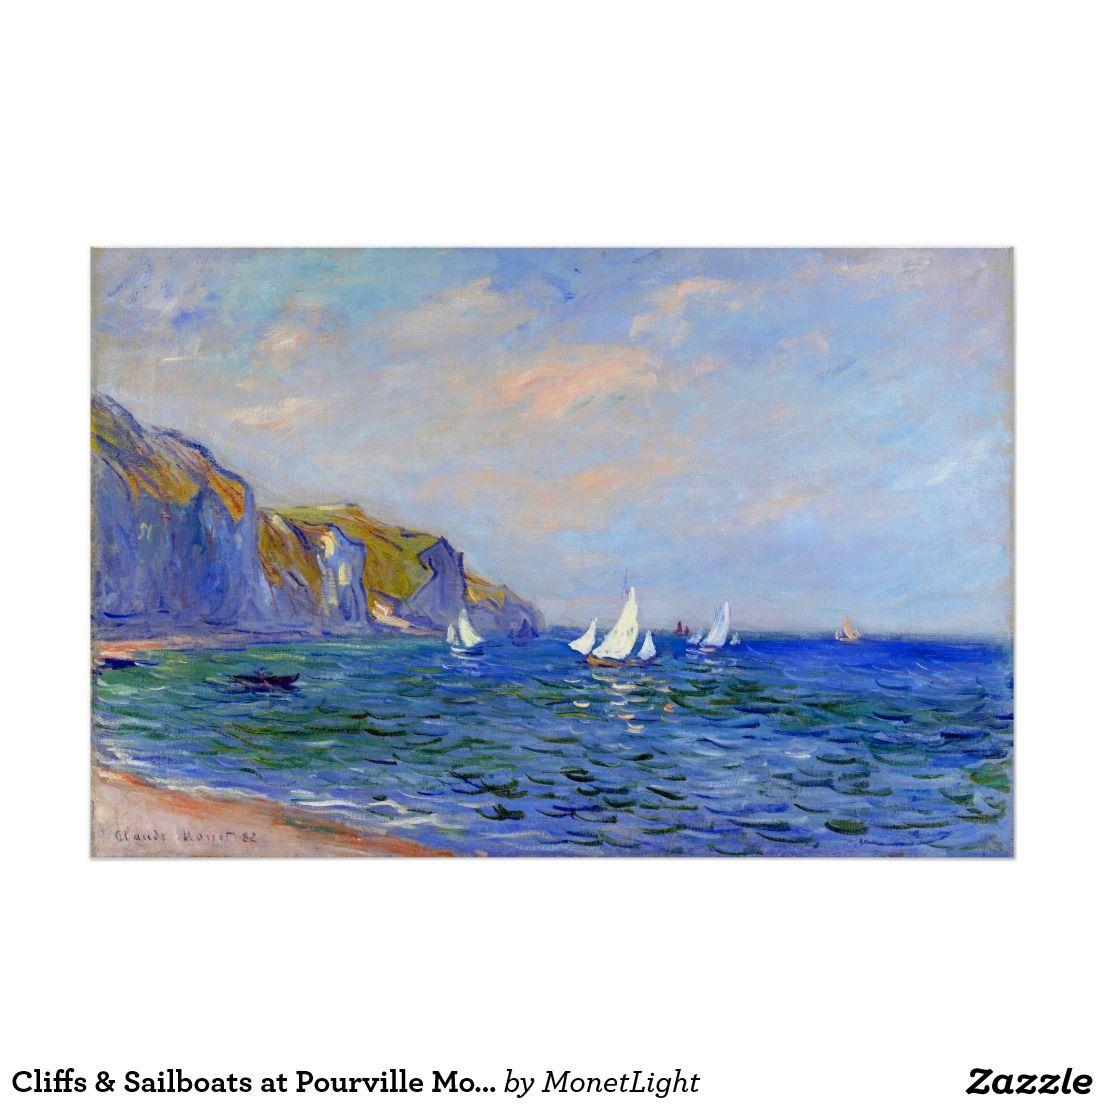 Cliffs & Sailboats at Pourville Monet Fine Art Poster